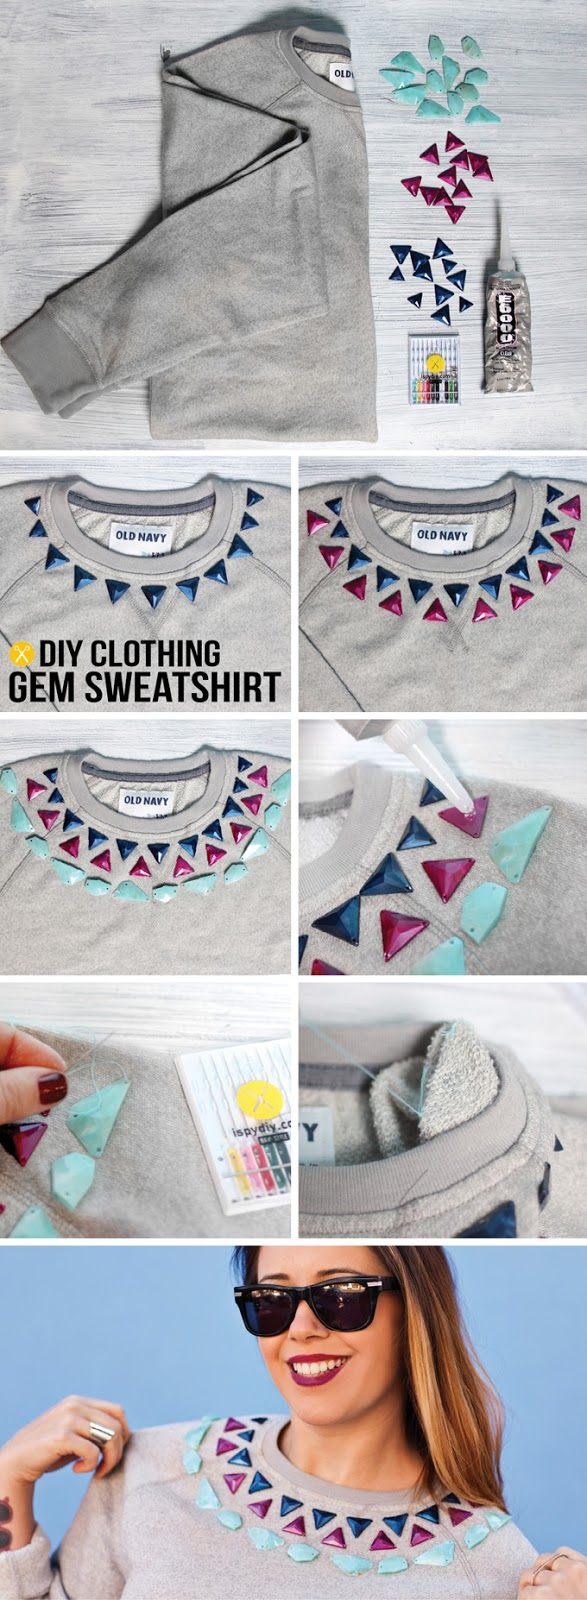 Inspiracje bluza 1